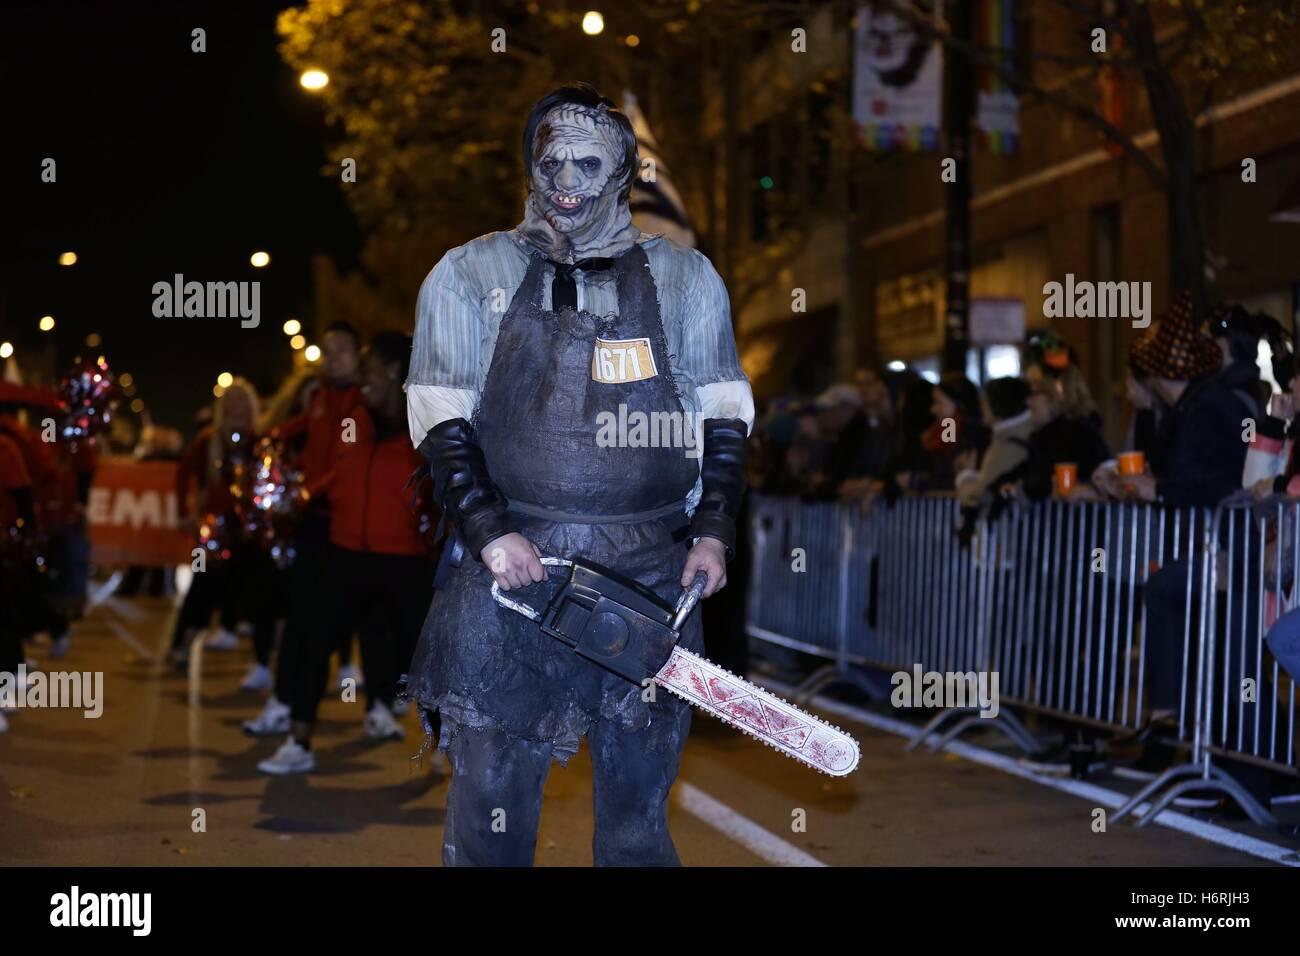 Chicago, USA. 31st Oct, 2016. A man attends a Halloween parade at ...